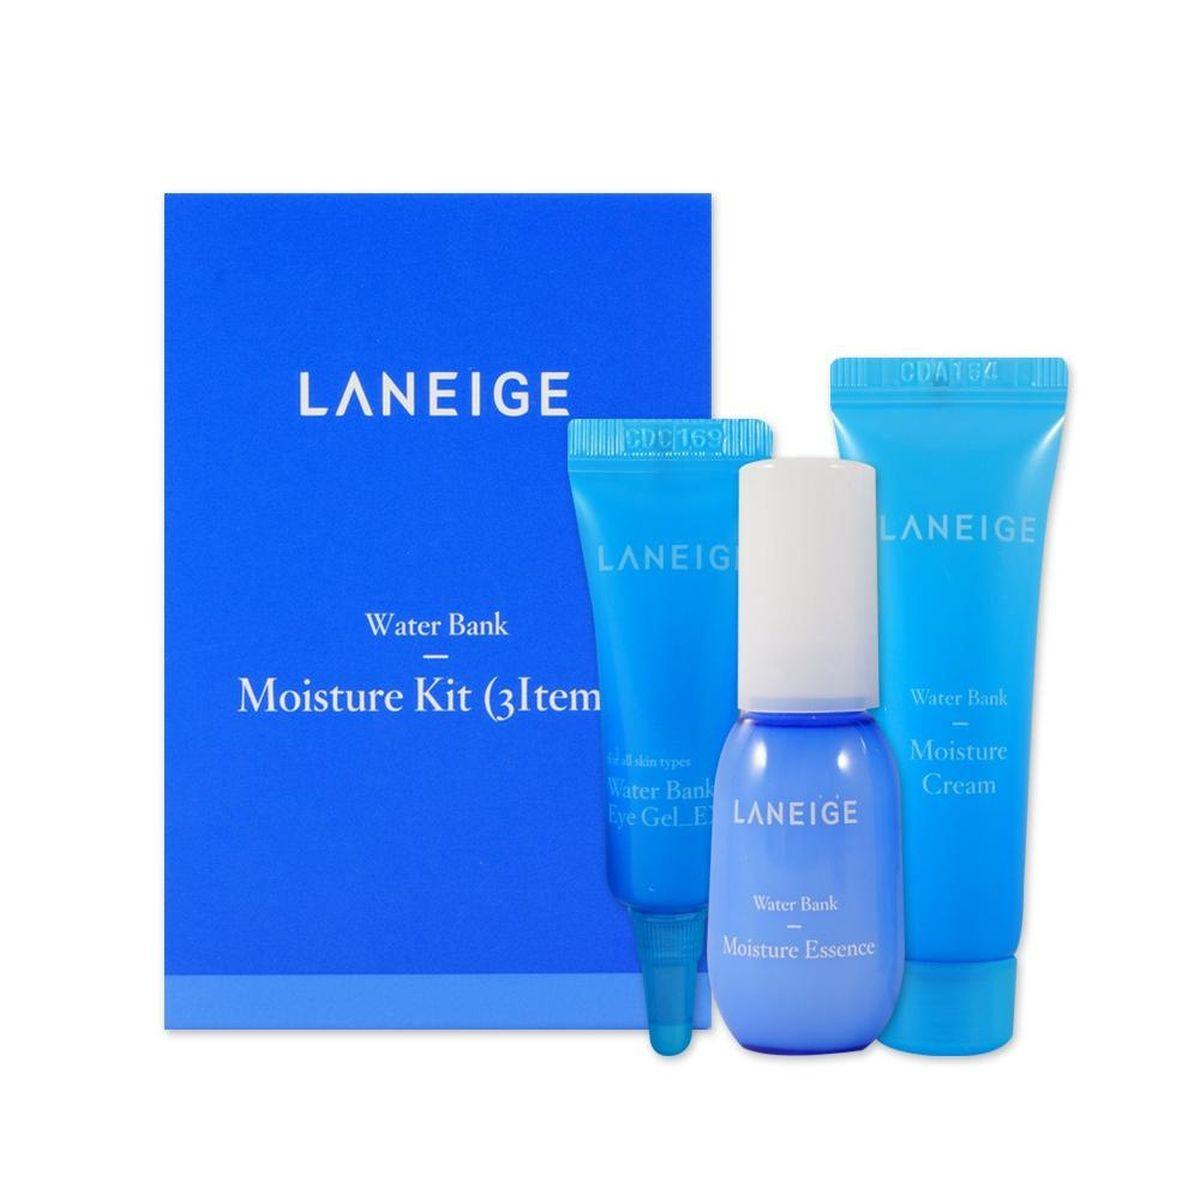 Набор миниатюр для увлажнения кожи Laneige Water Bank Moisture Kit 3 items